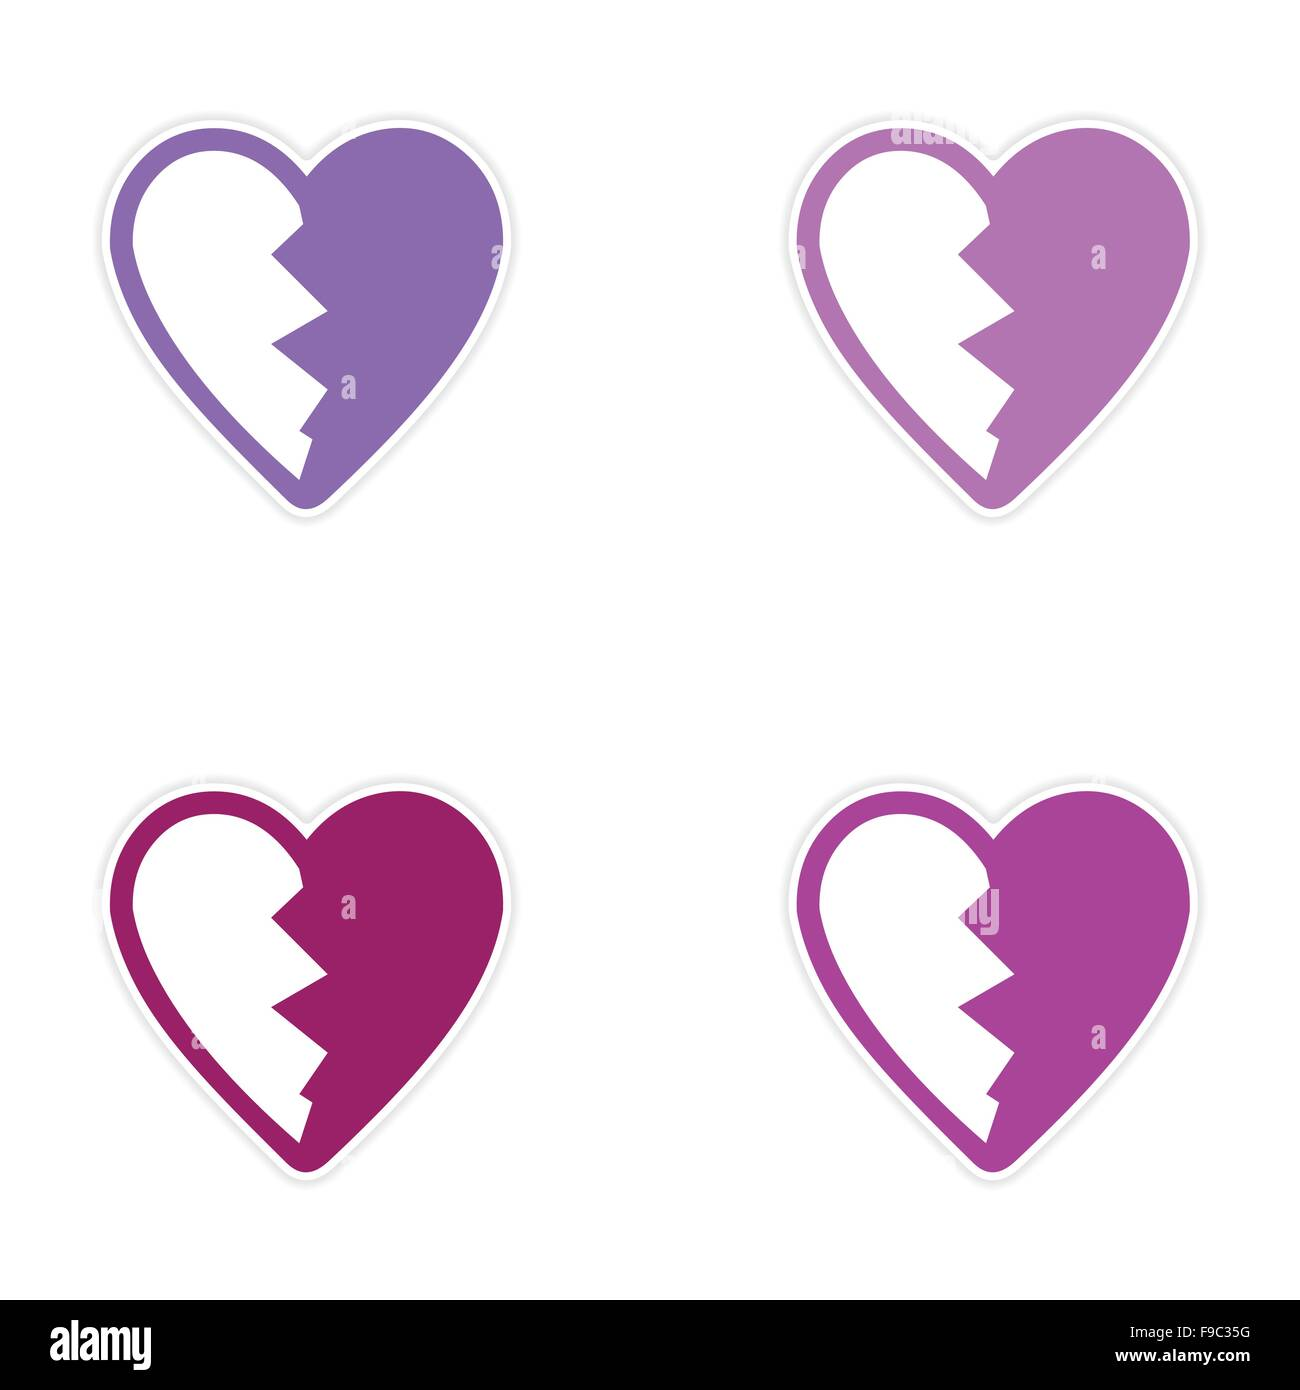 Broken Heart Vector Imágenes De Stock & Broken Heart Vector Fotos De ...